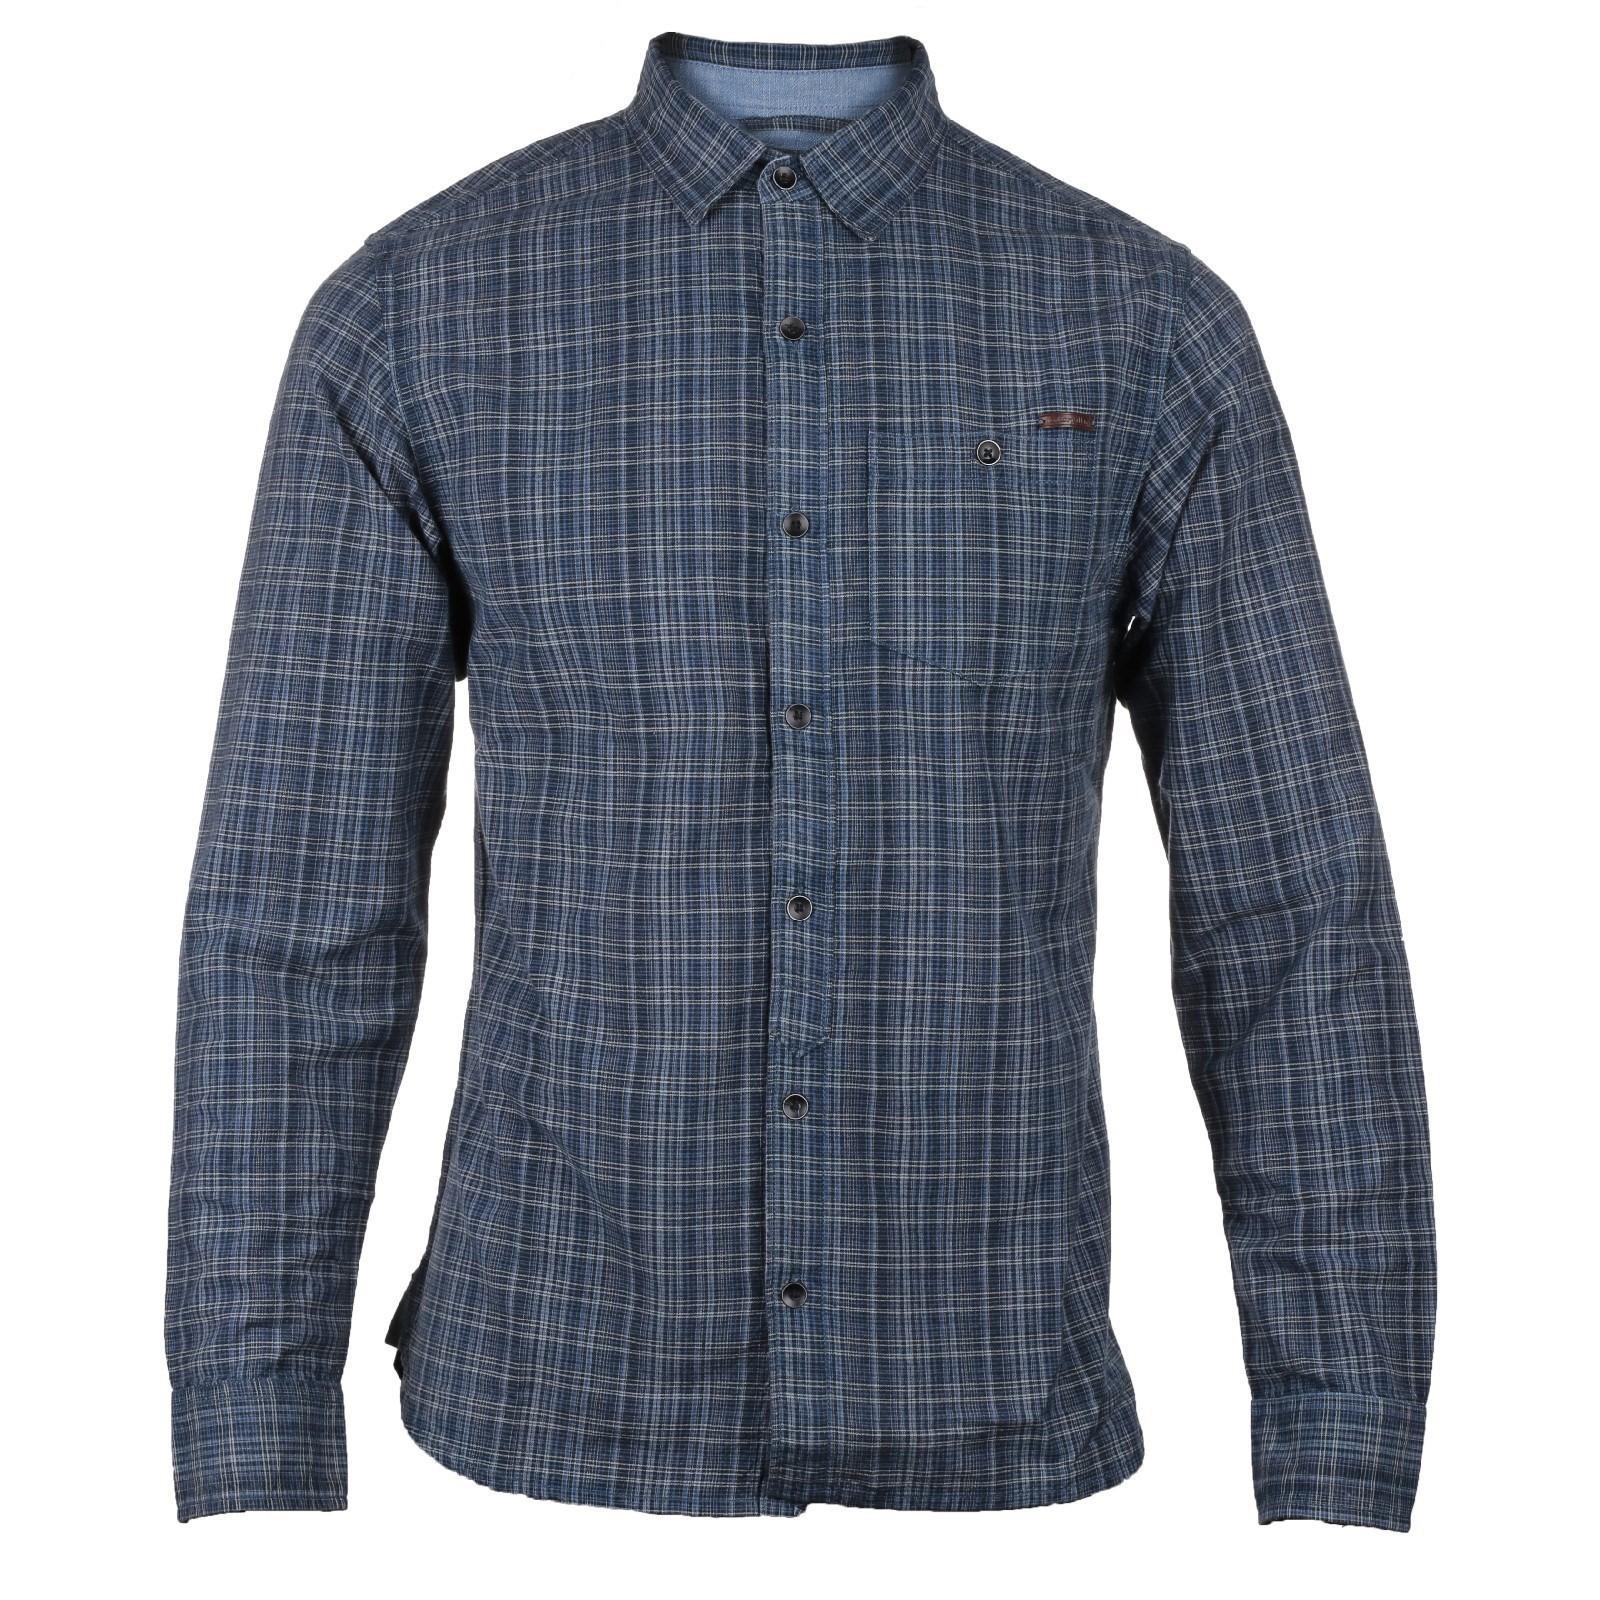 CAT Lifestyle Mens Radford Long Sleeve Shirt (L) (Plaid)